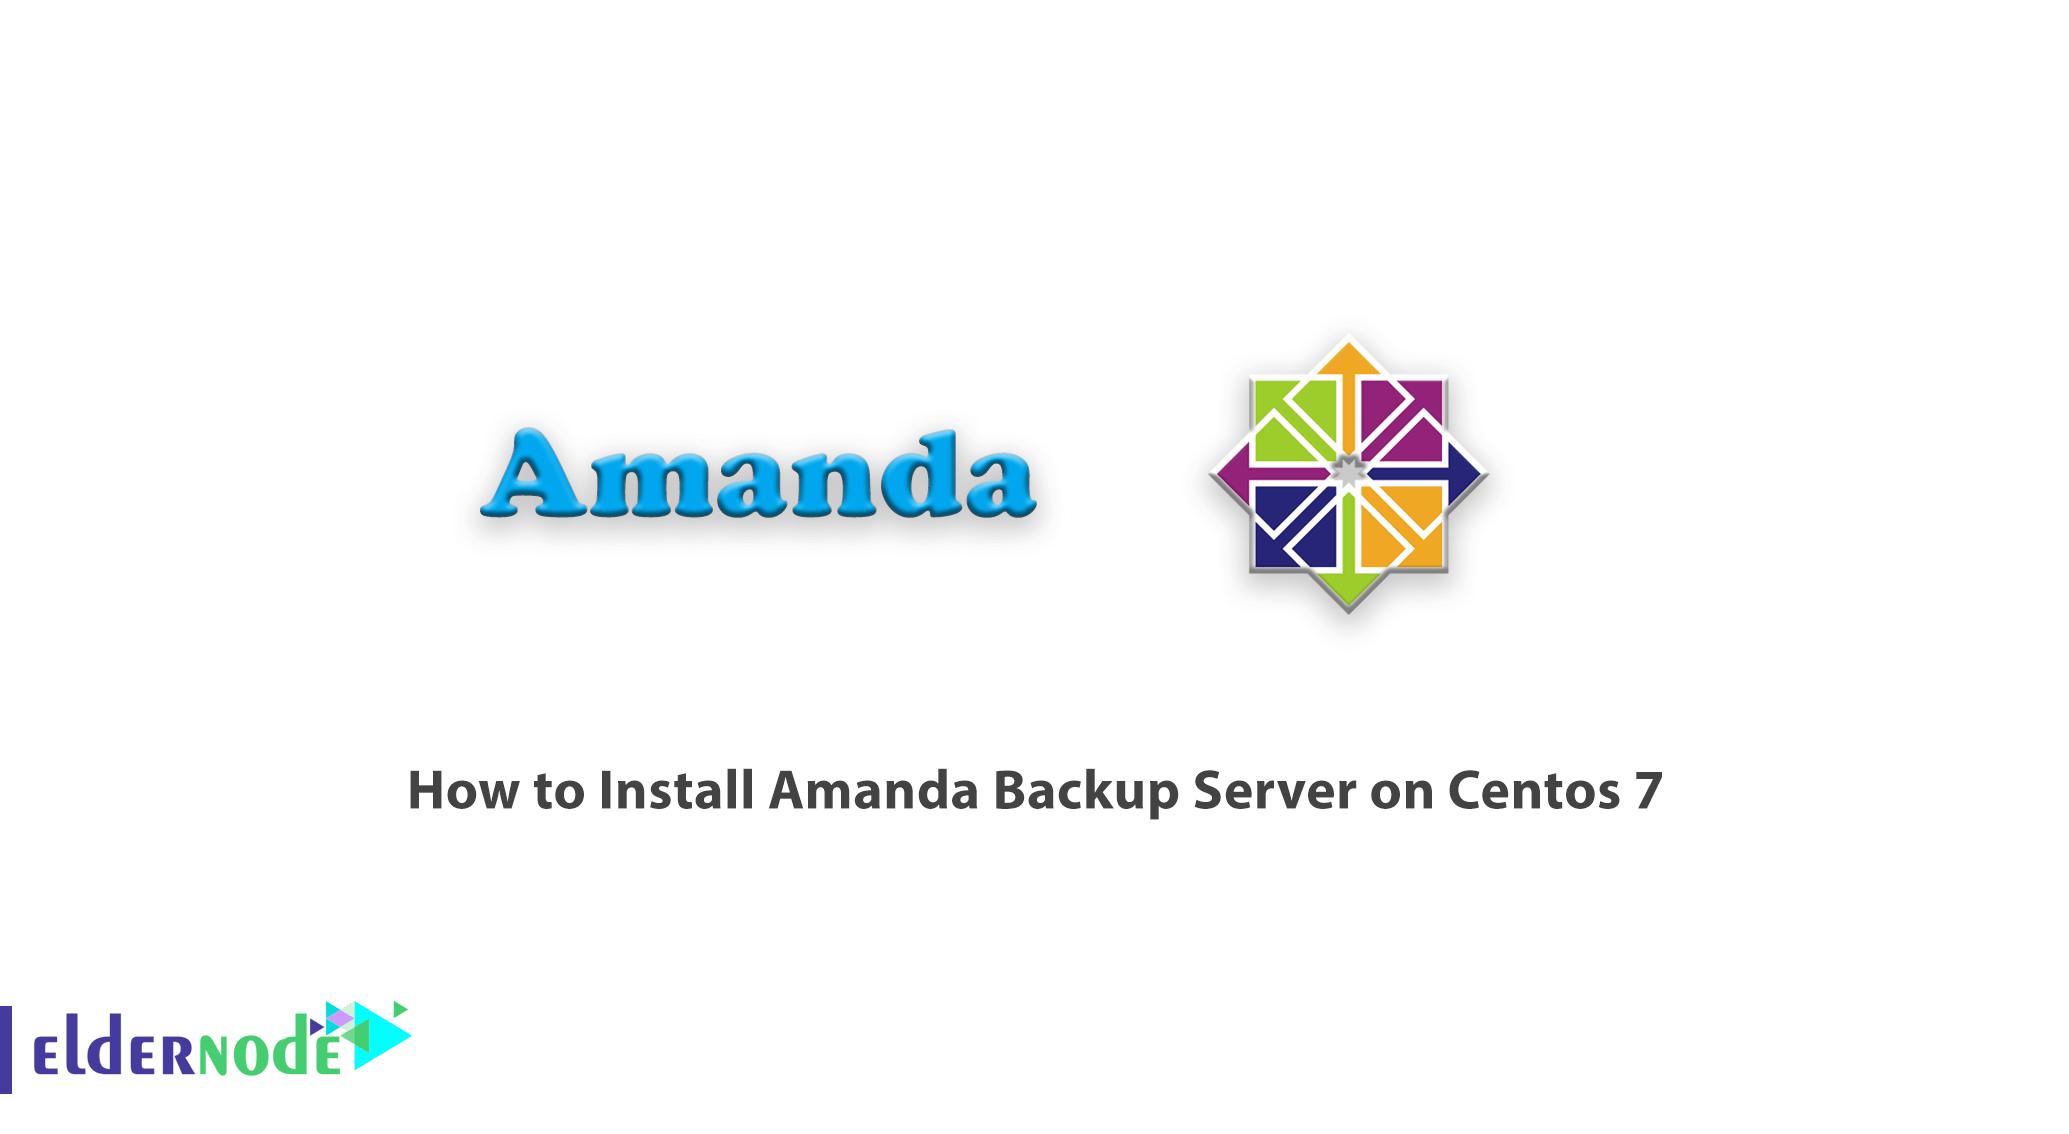 How to Install Amanda Backup Server on Centos 7